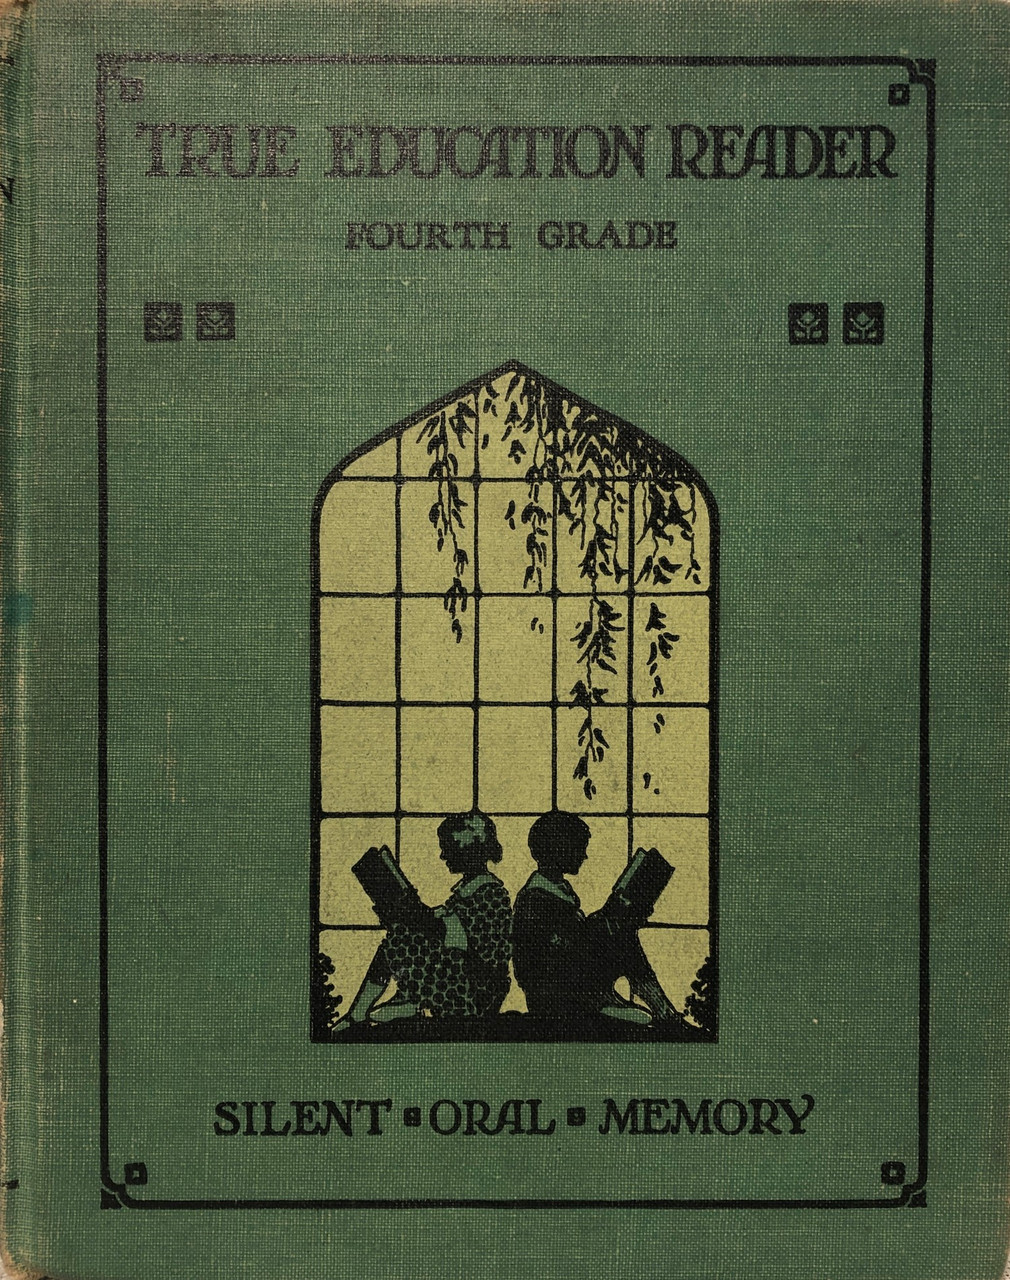 True Education Reader #4 / Peck, Sarah Elizabeth / (HB/1953